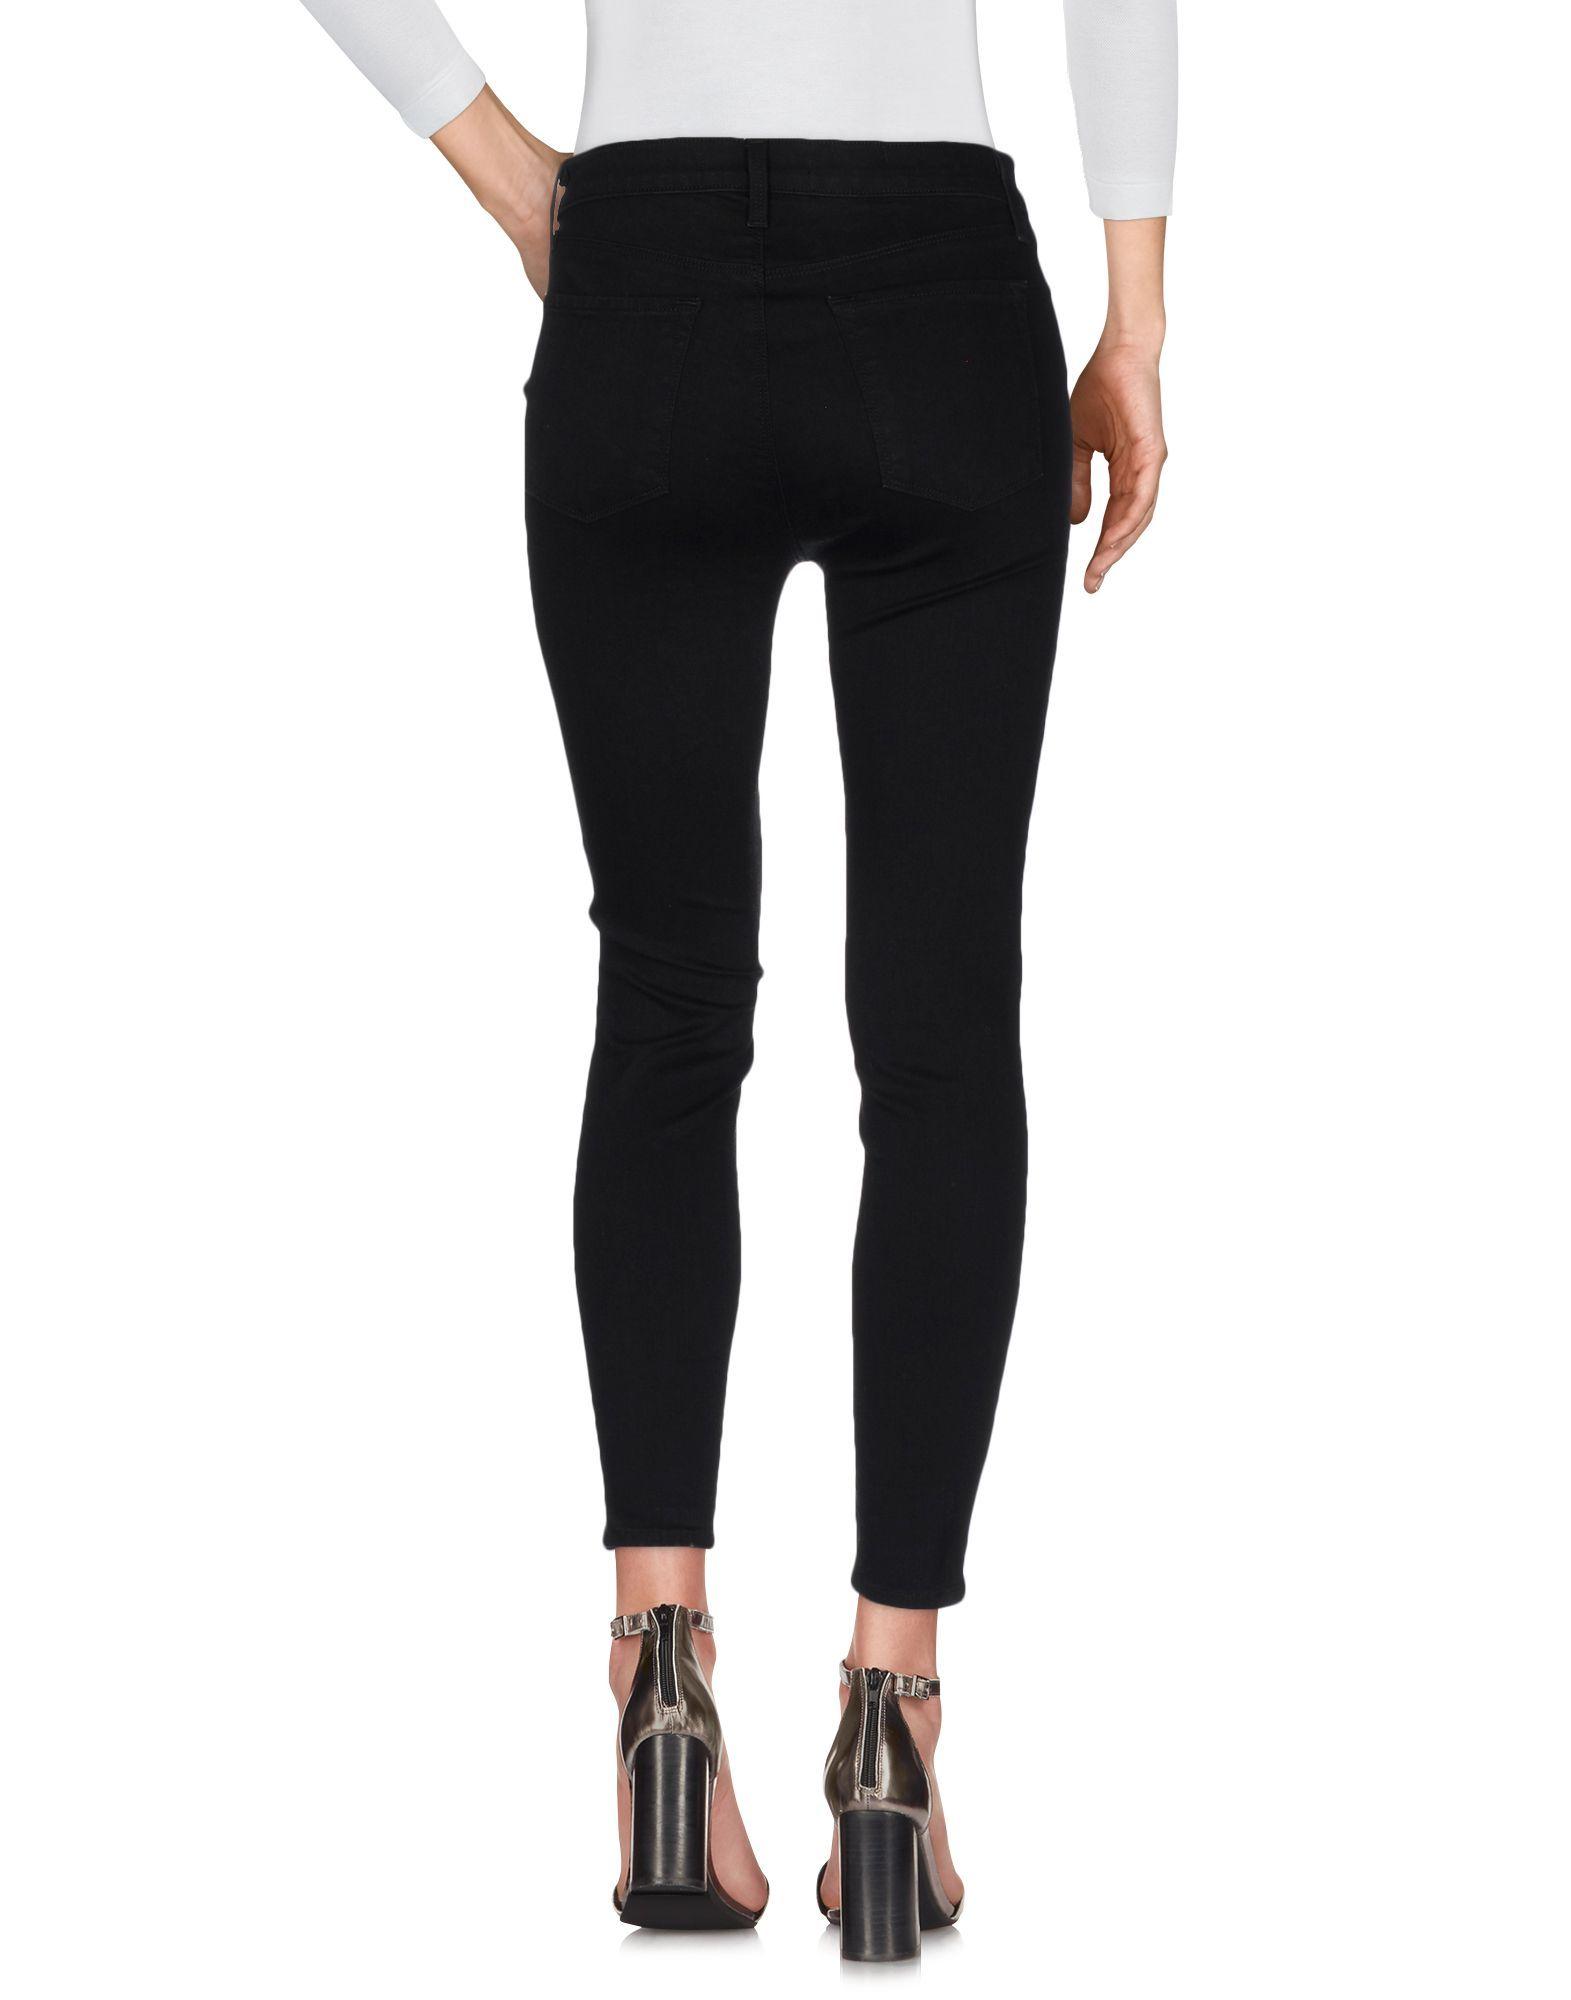 J Brand Black Cotton Skinny Jeans